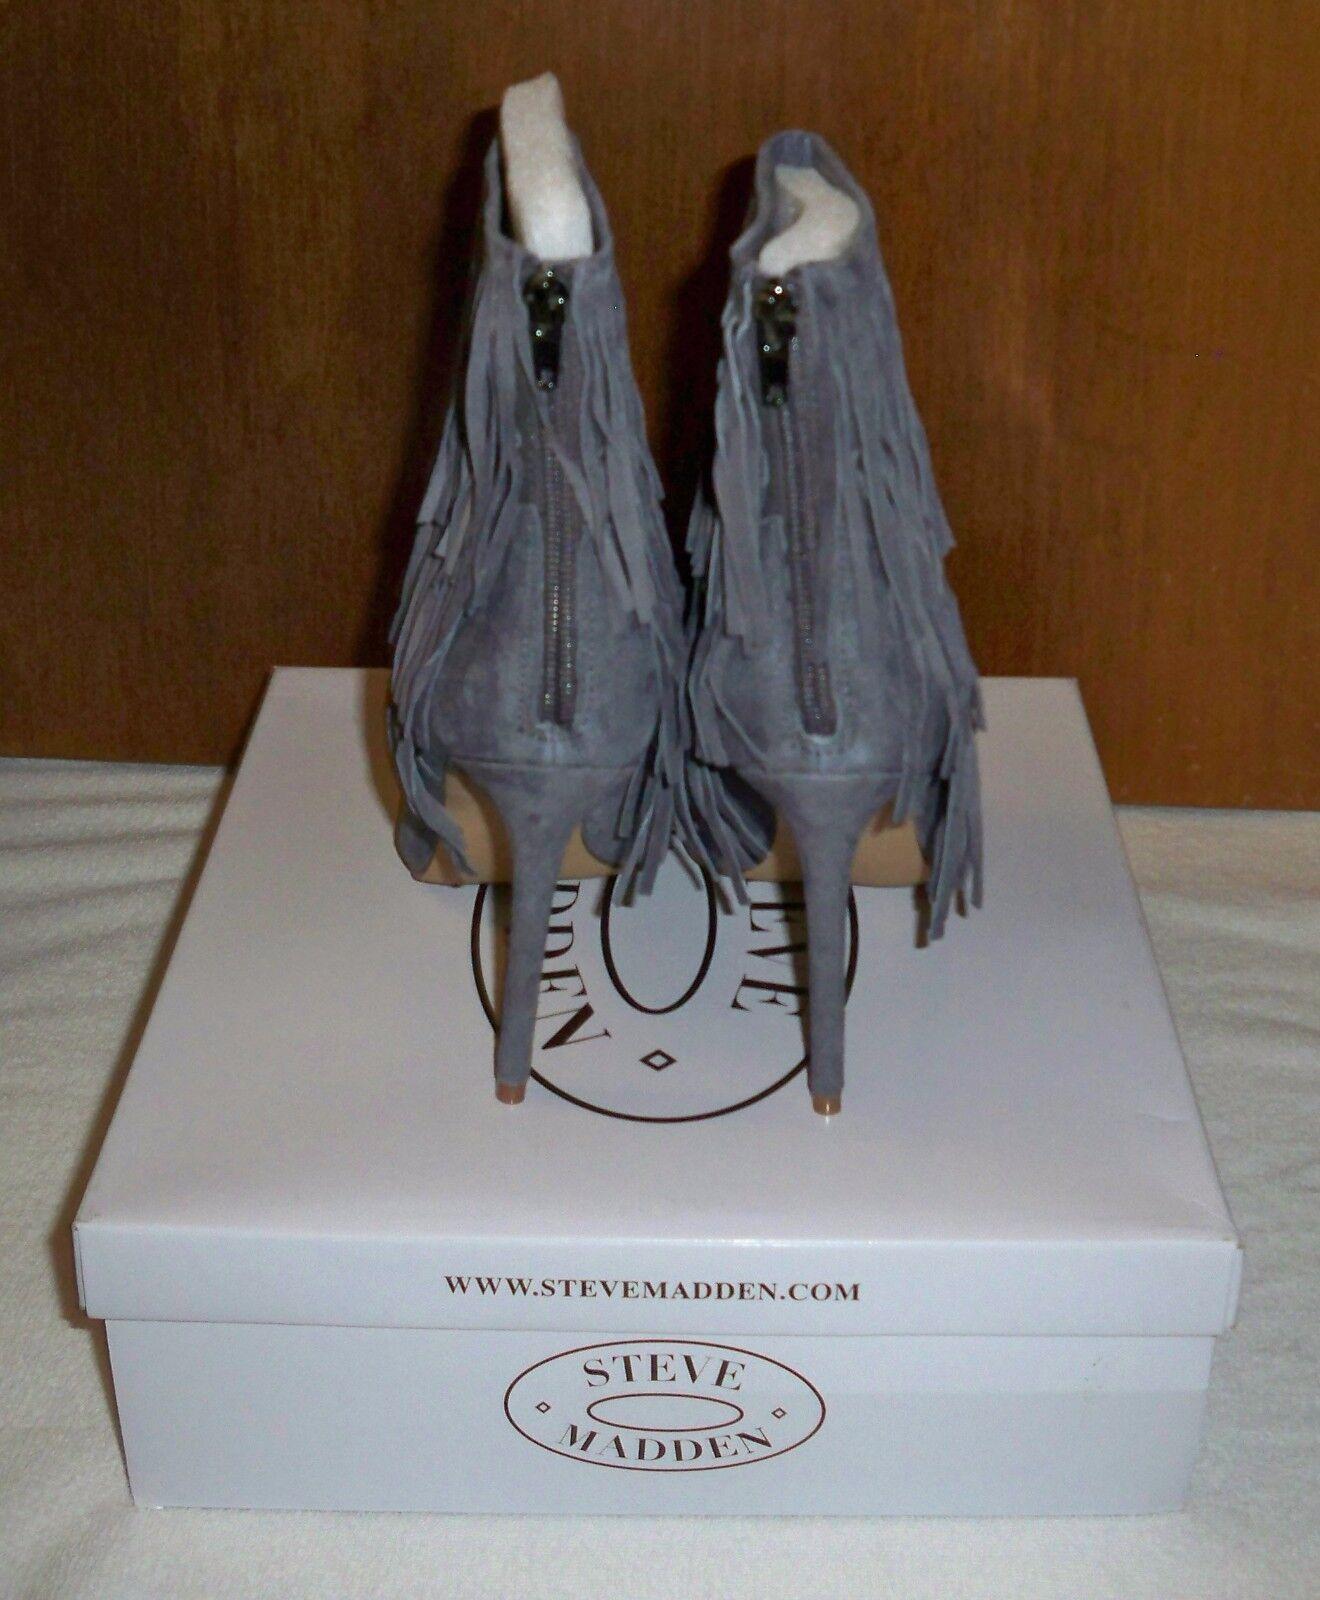 Steve Madden Flapper SZ Gray Fringe Suede Stiefel SZ Flapper 81/2 NIB, BIG SALE 481031